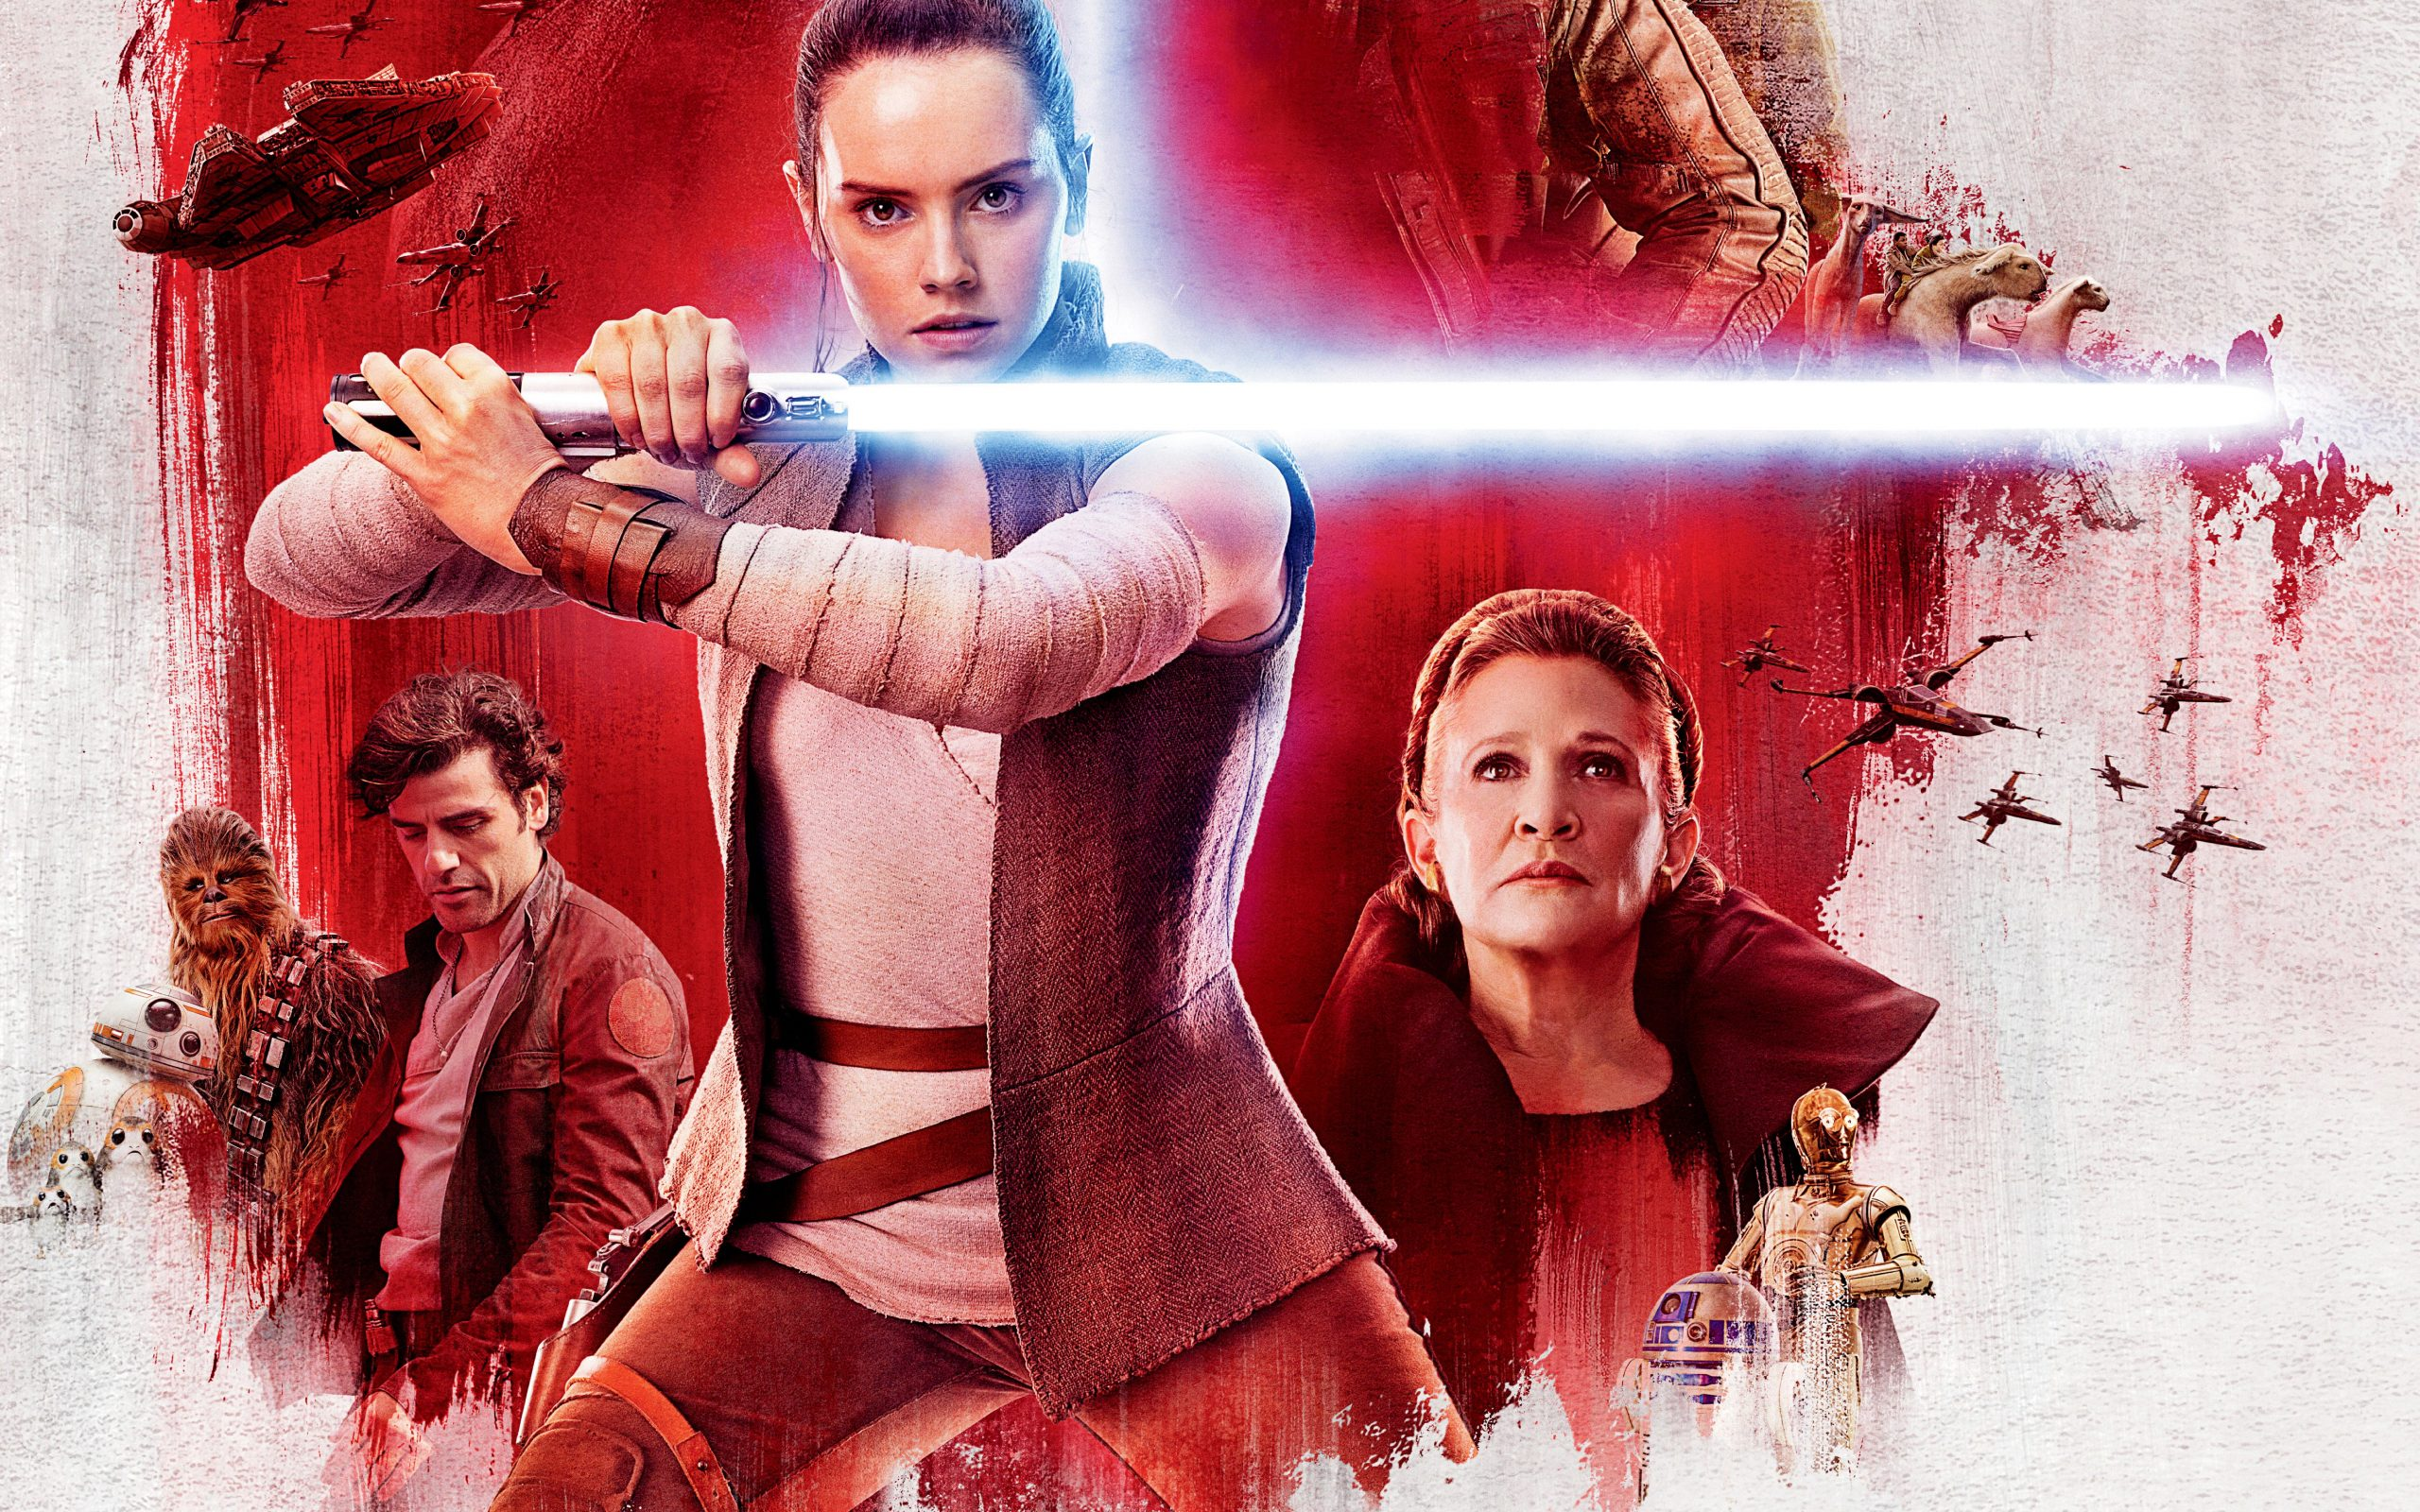 Star Wars The Last Jedi Movie Poster 5k Wallpaper Best Wallpapers